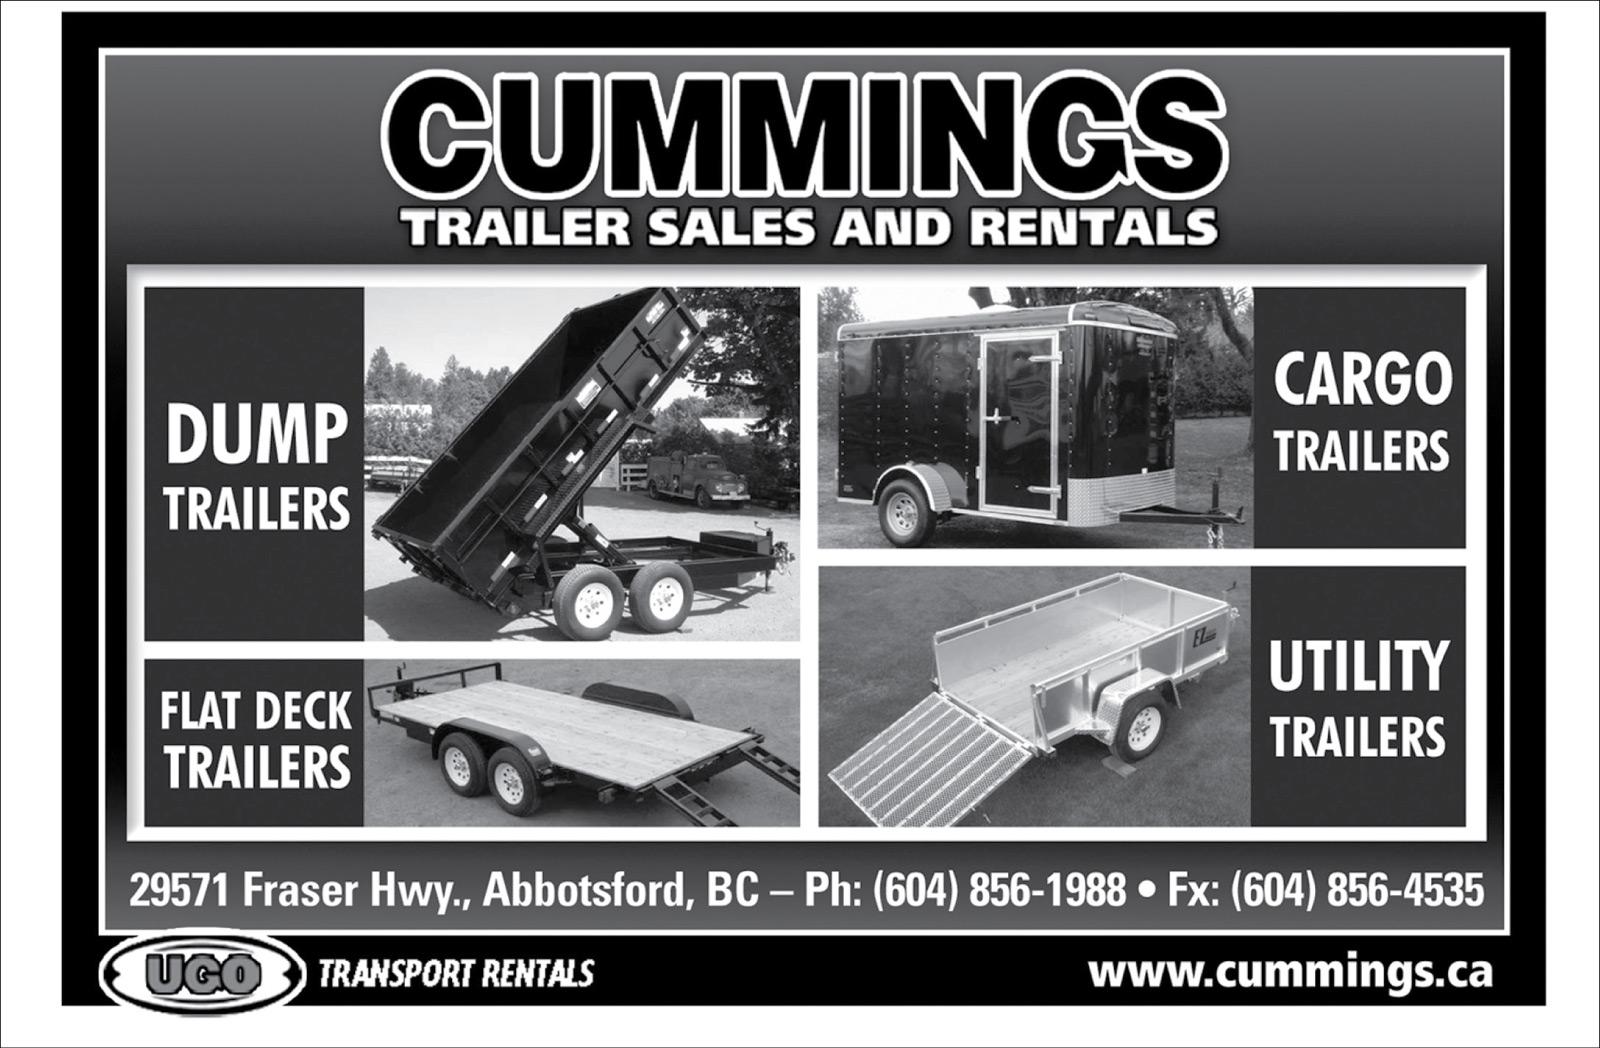 Cummings Trailer Sales and Rentals